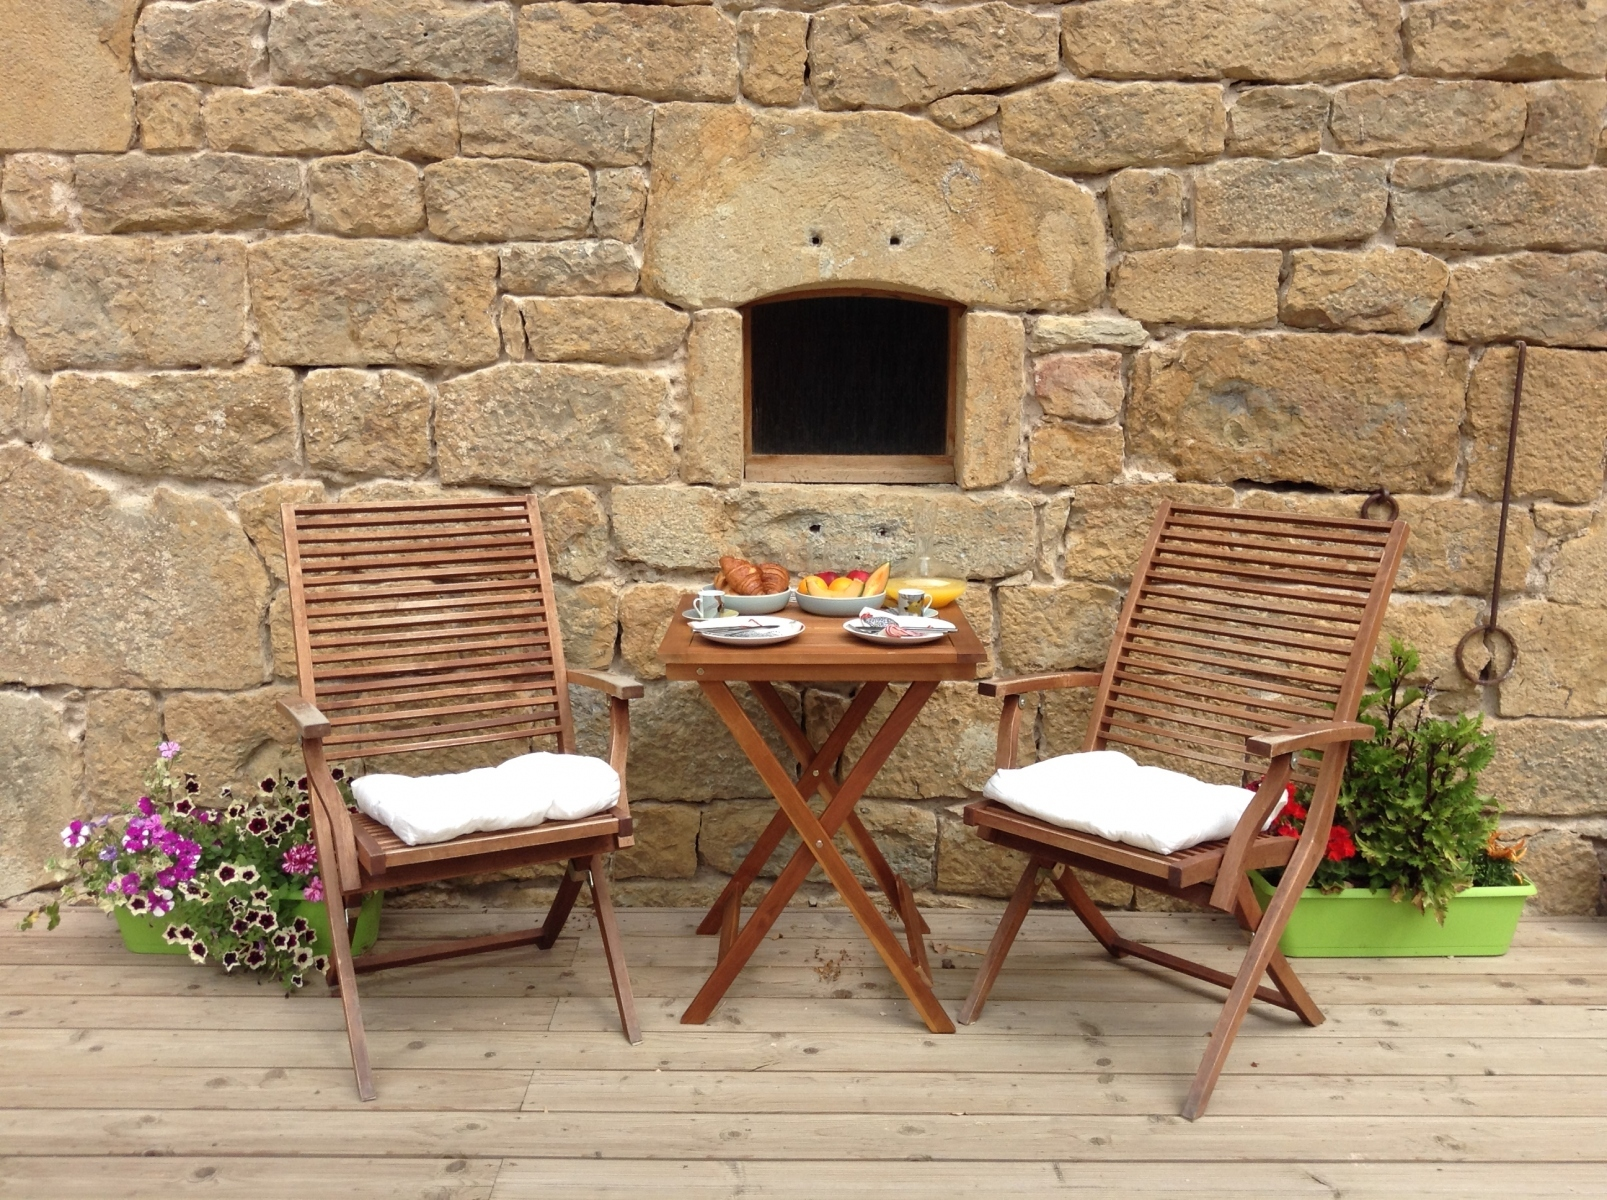 Breakfast-outdoors